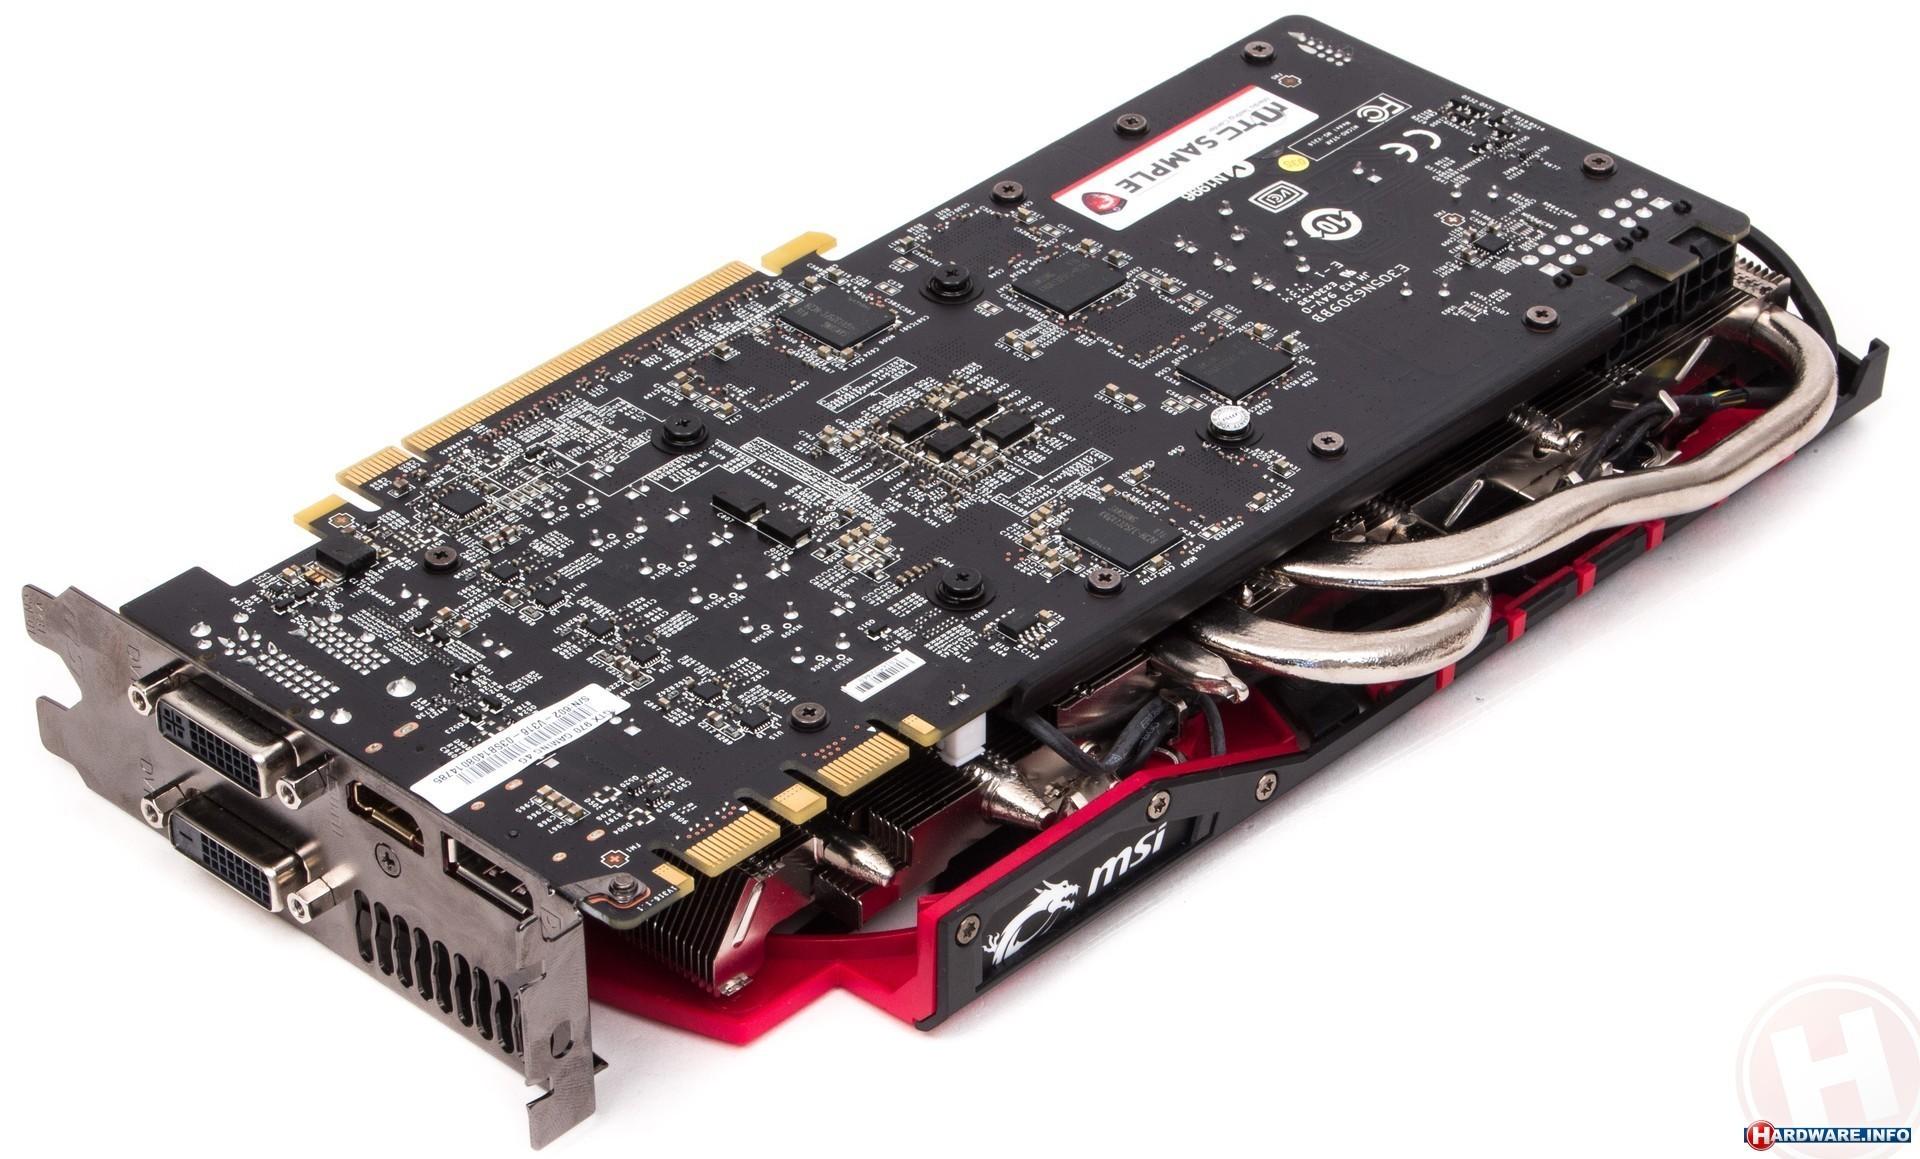 MSI GeForce GTX 970 Gaming 4GB videokaart - Hardware Info